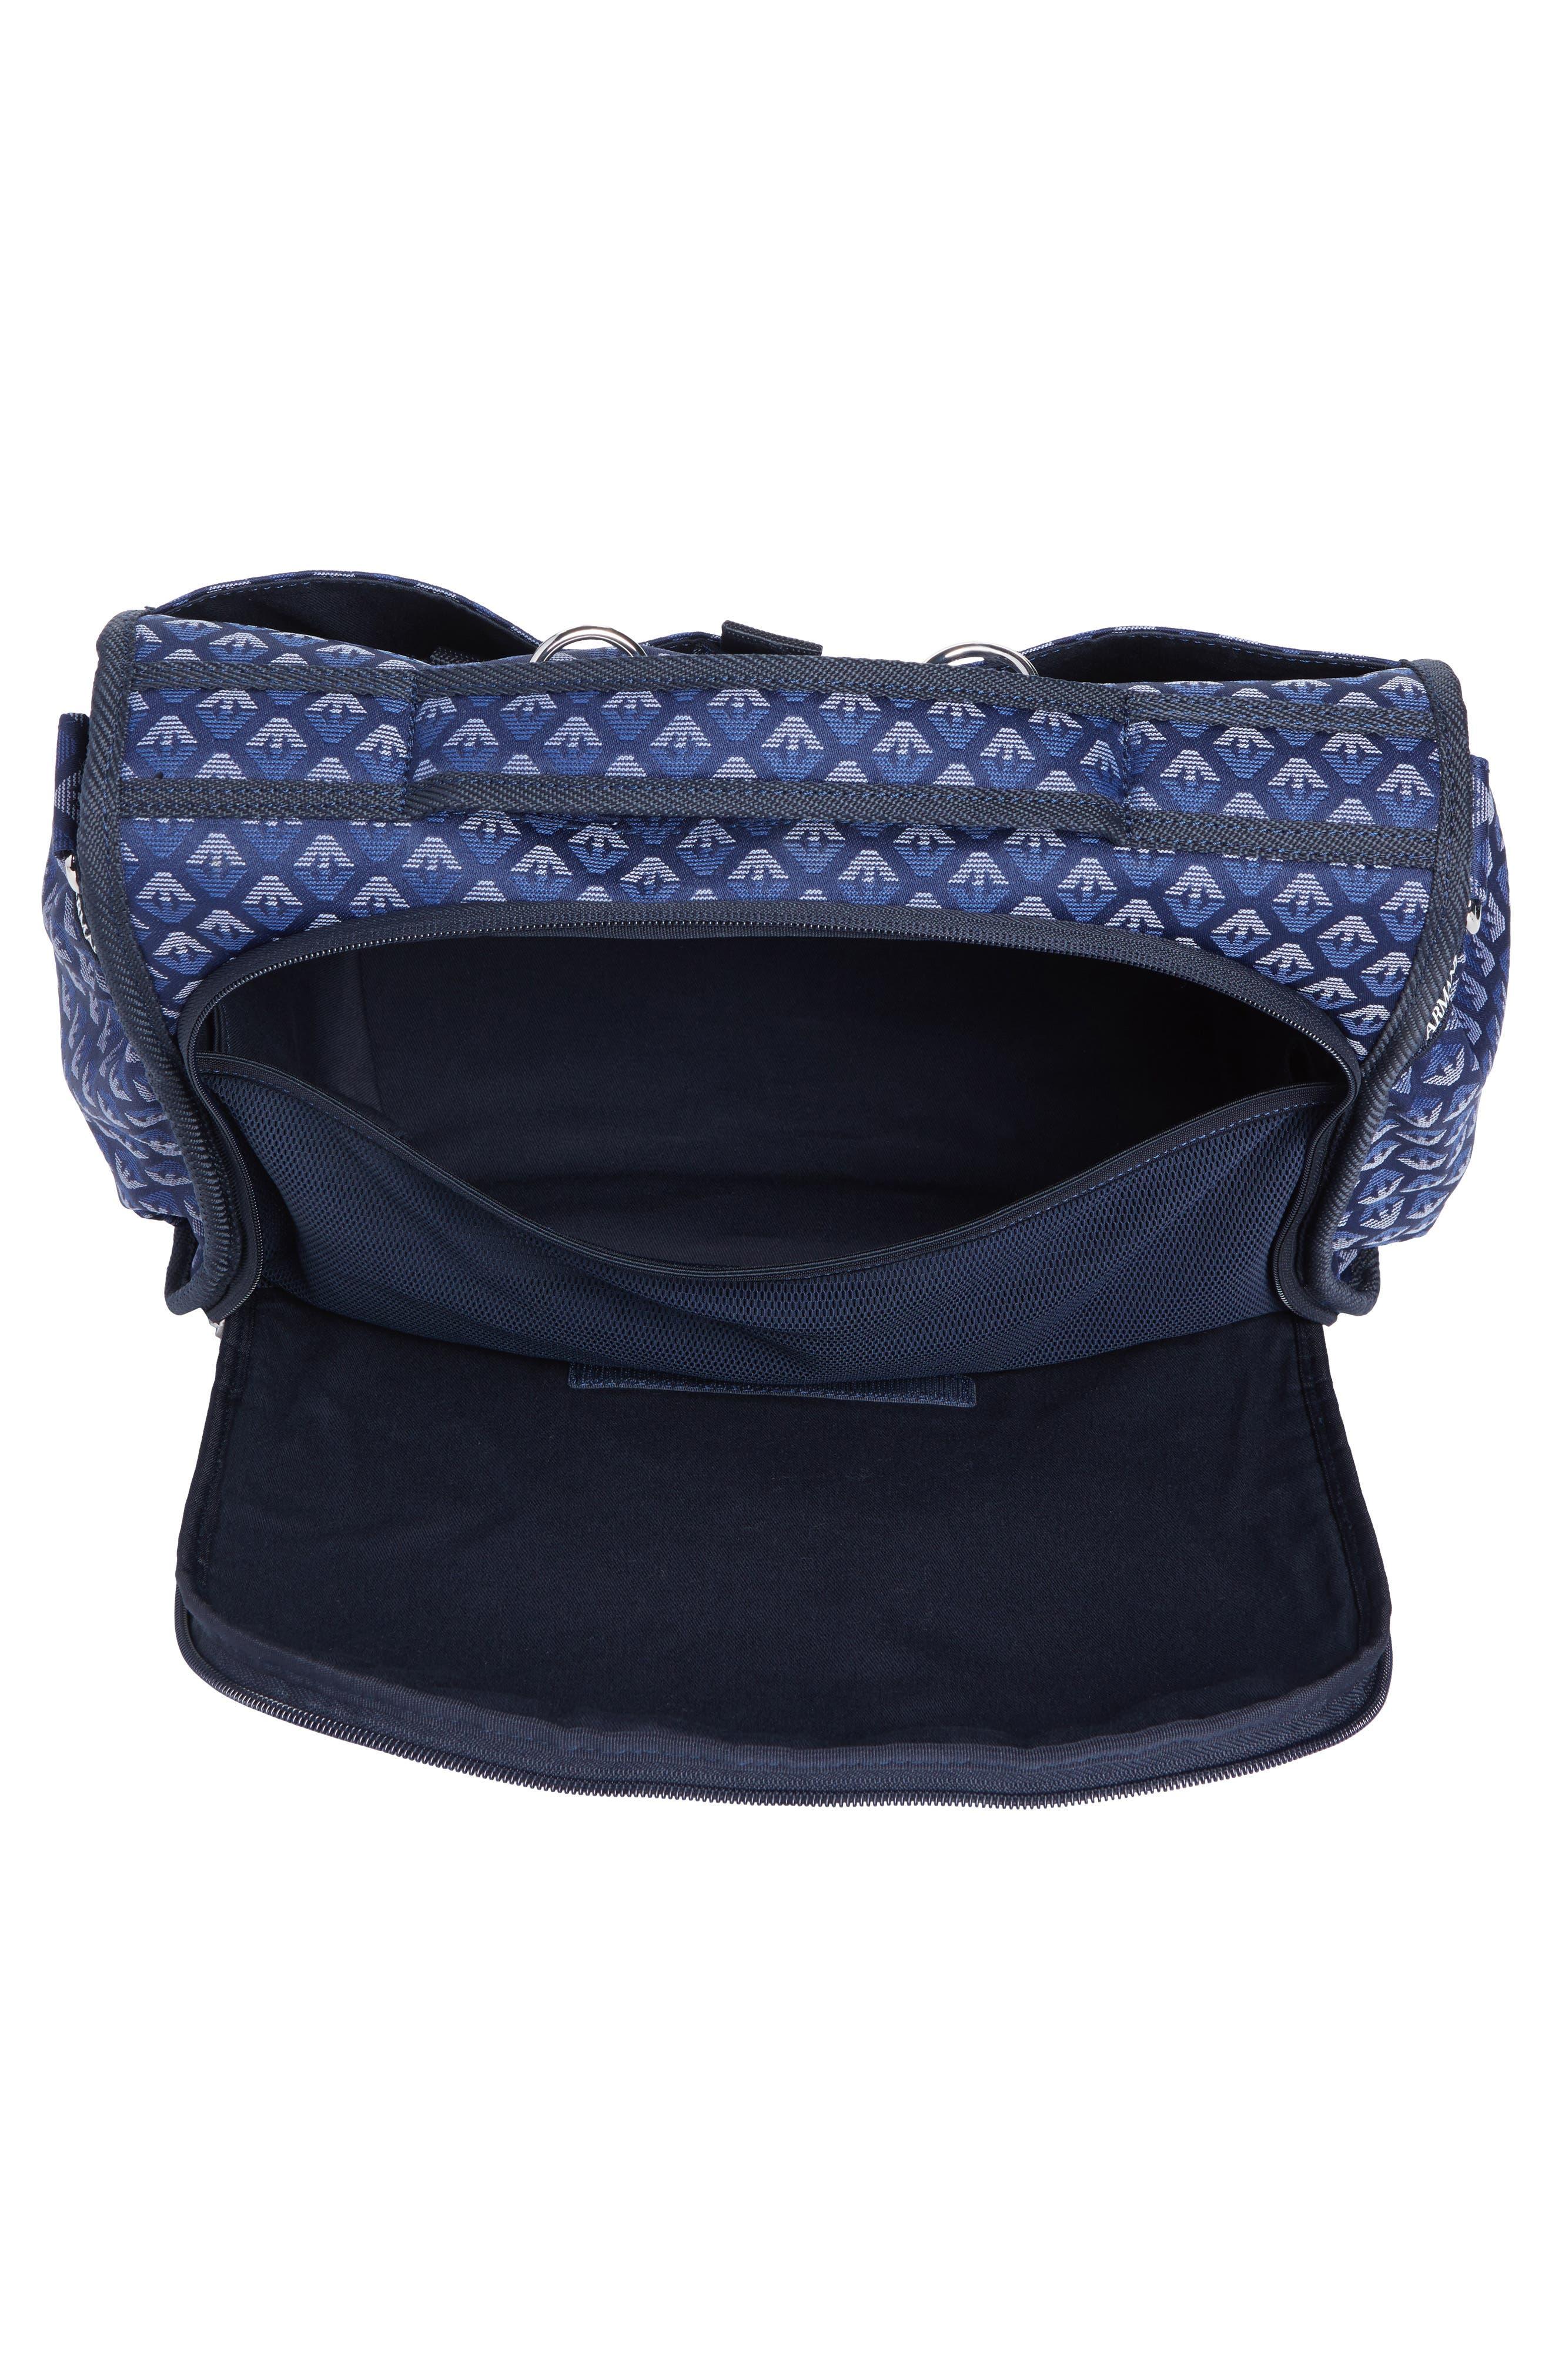 Diaper Bag,                             Alternate thumbnail 3, color,                             NAVY BLUE